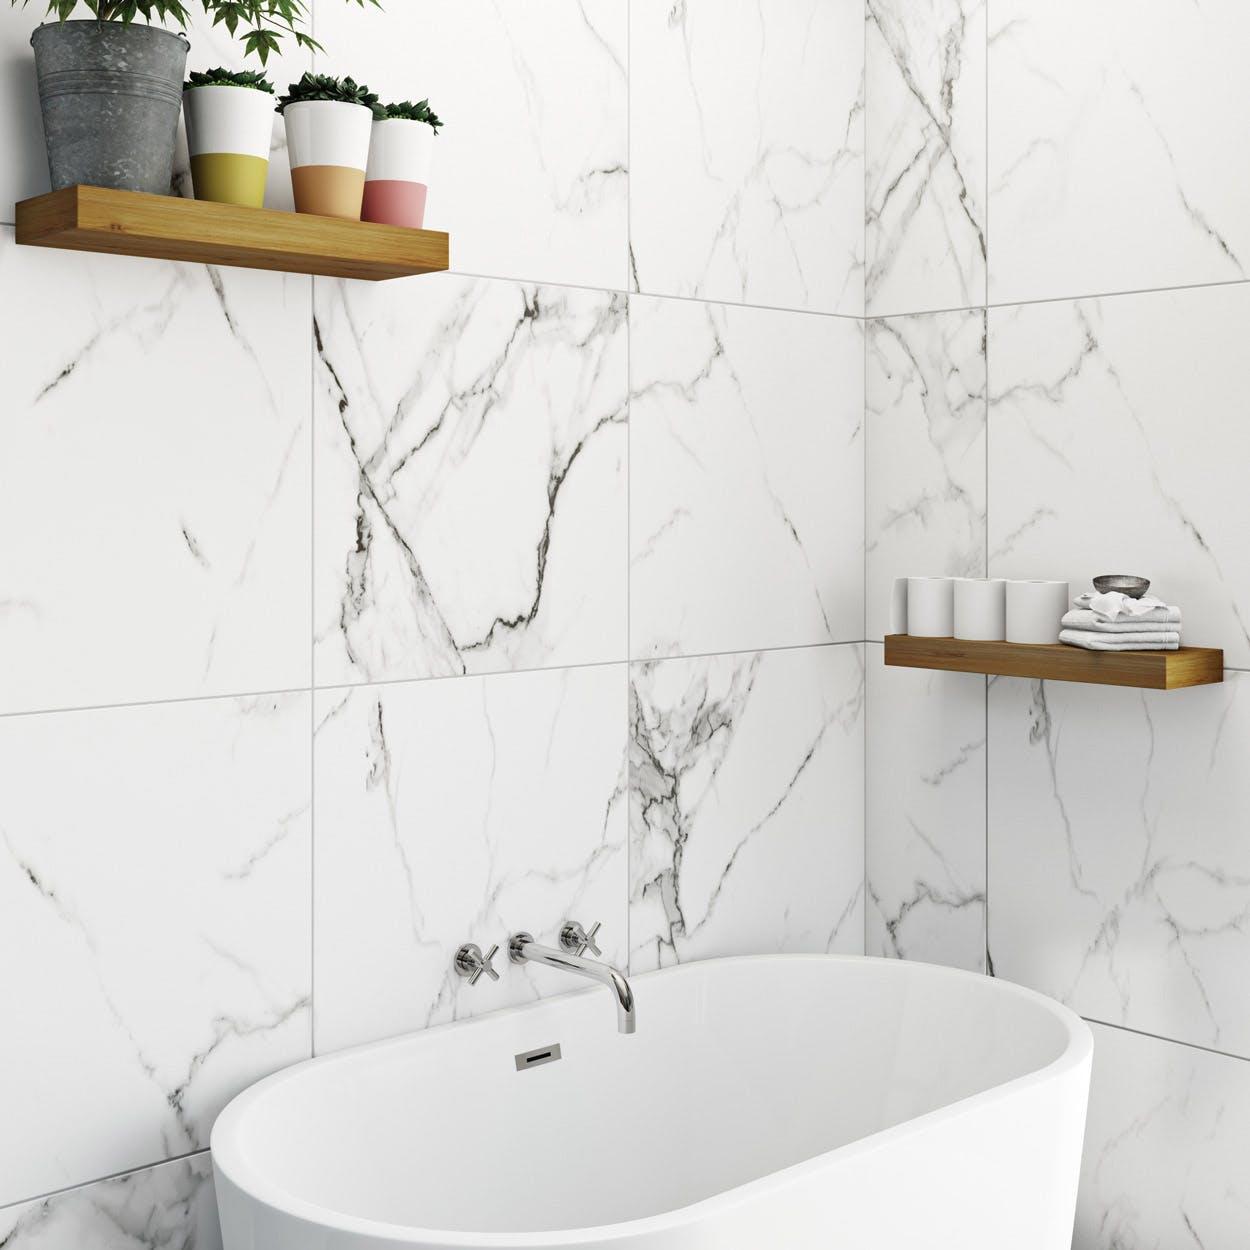 White Marble Bathroom Floor Tile Image Of Bathroom And Closet